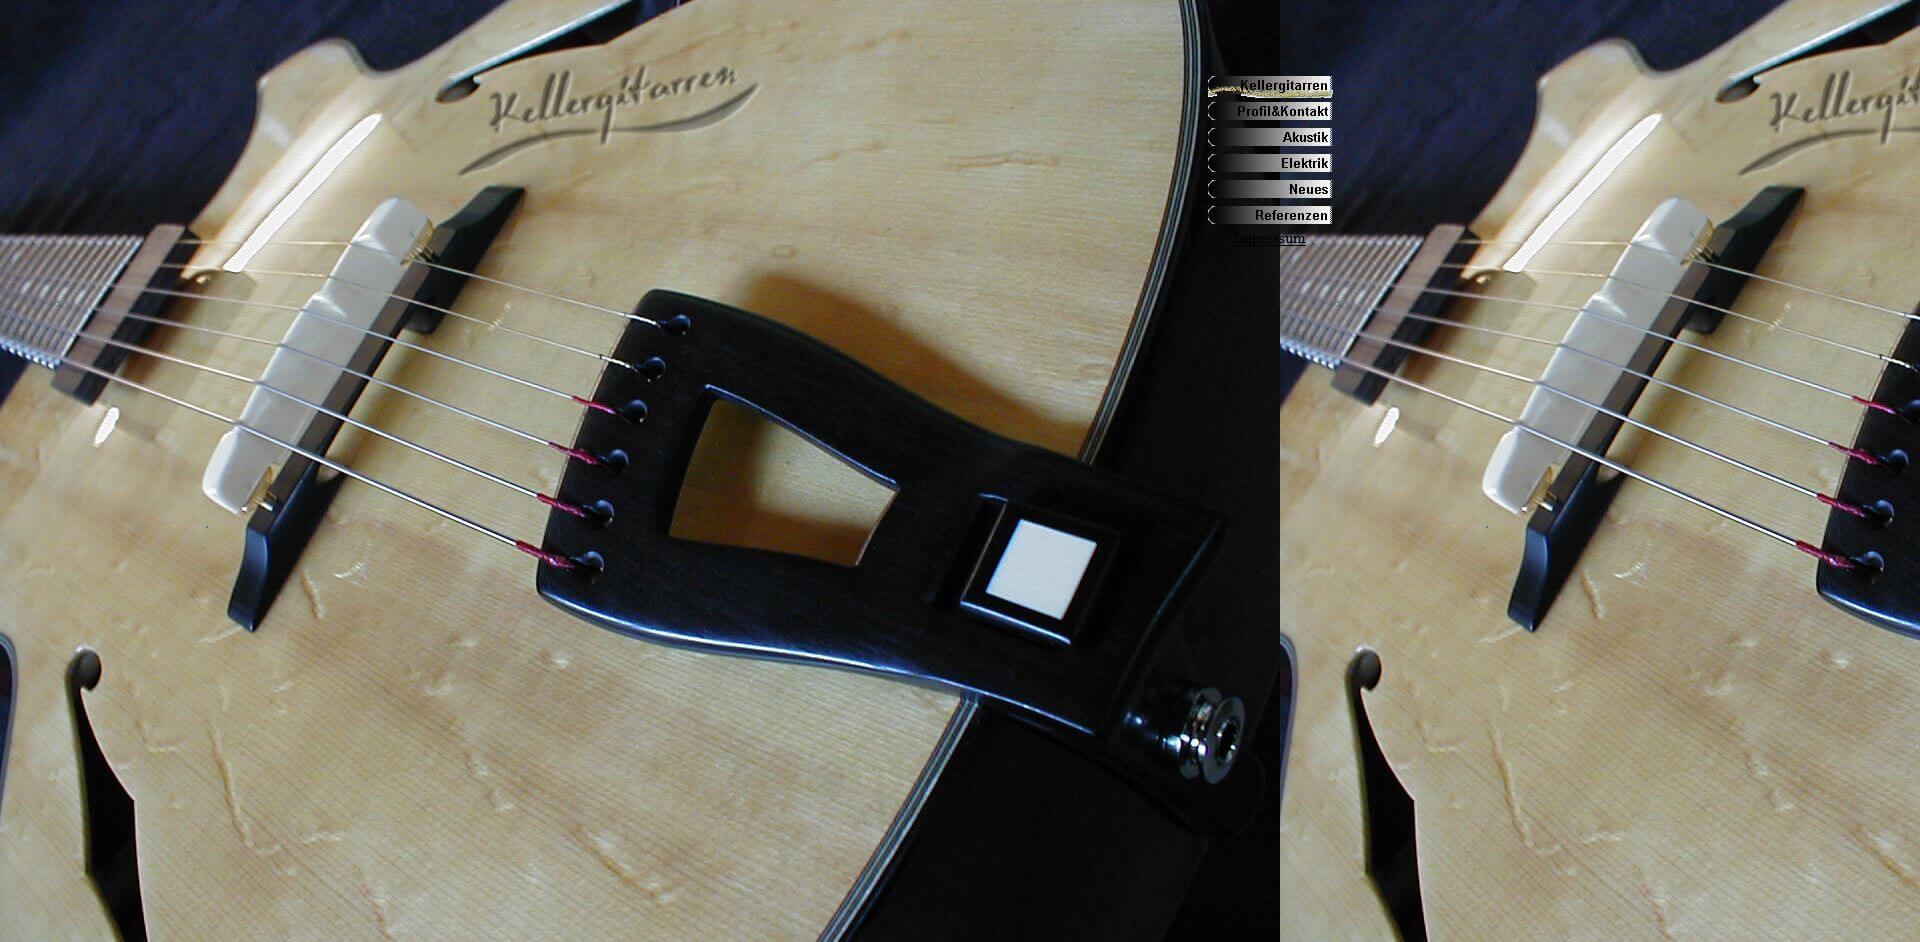 Gitarrenladen München Kellergitarren